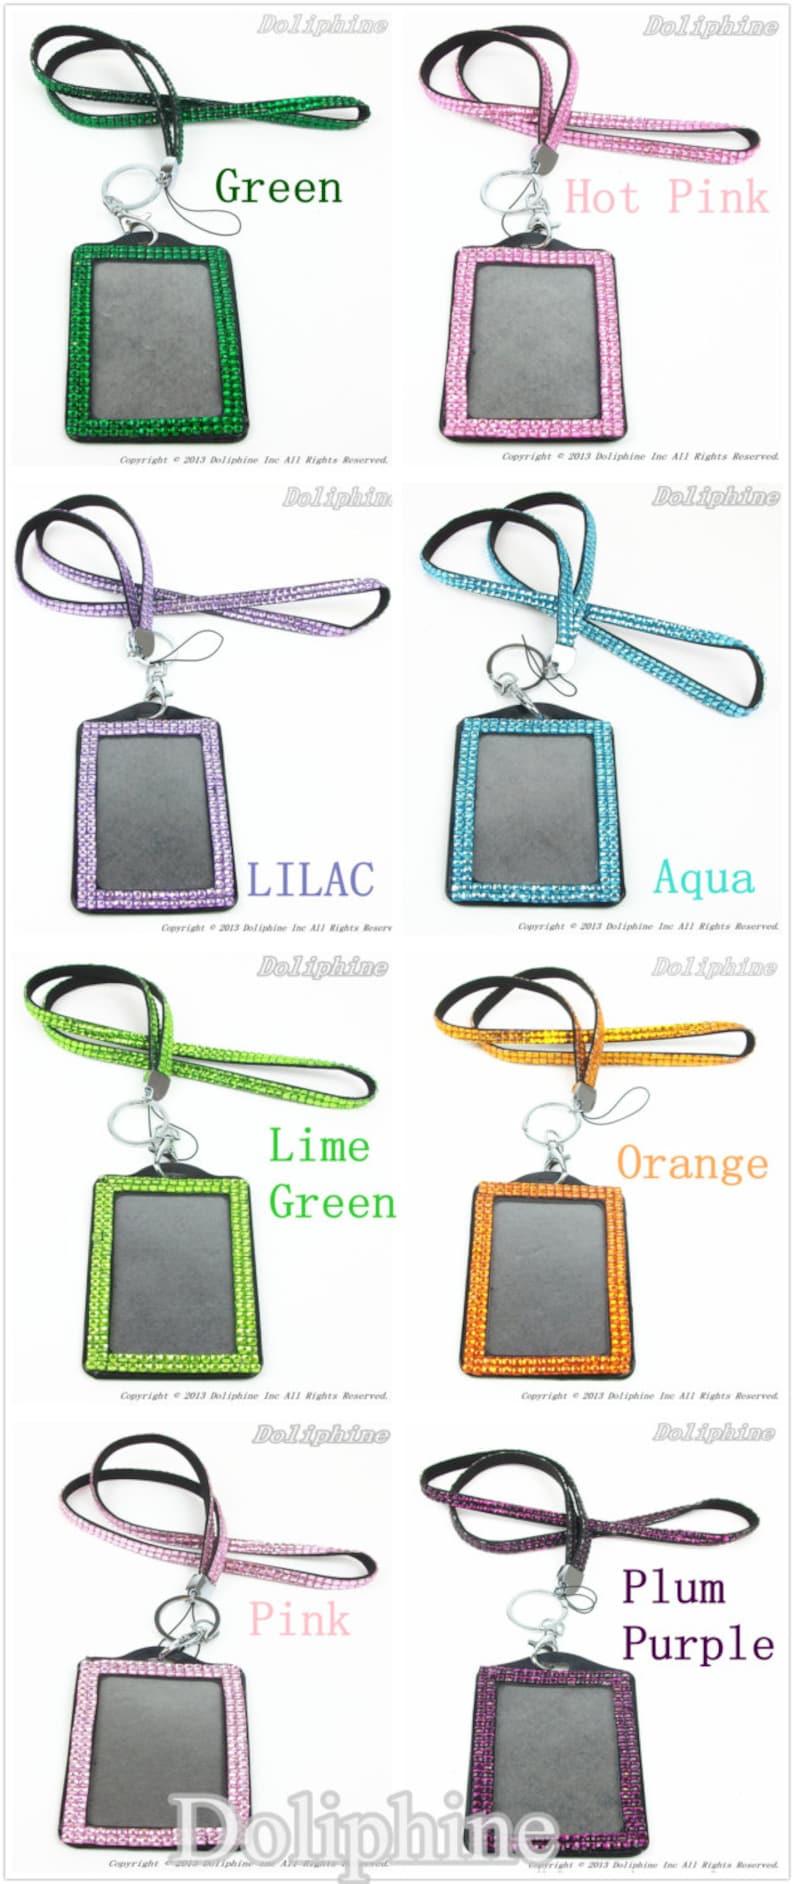 Multi-Colors Rhinestone Crystal Bling Necklace LANYARDs Key Chain Key Holder /& Vertical  Horizontal ID Badge Holder